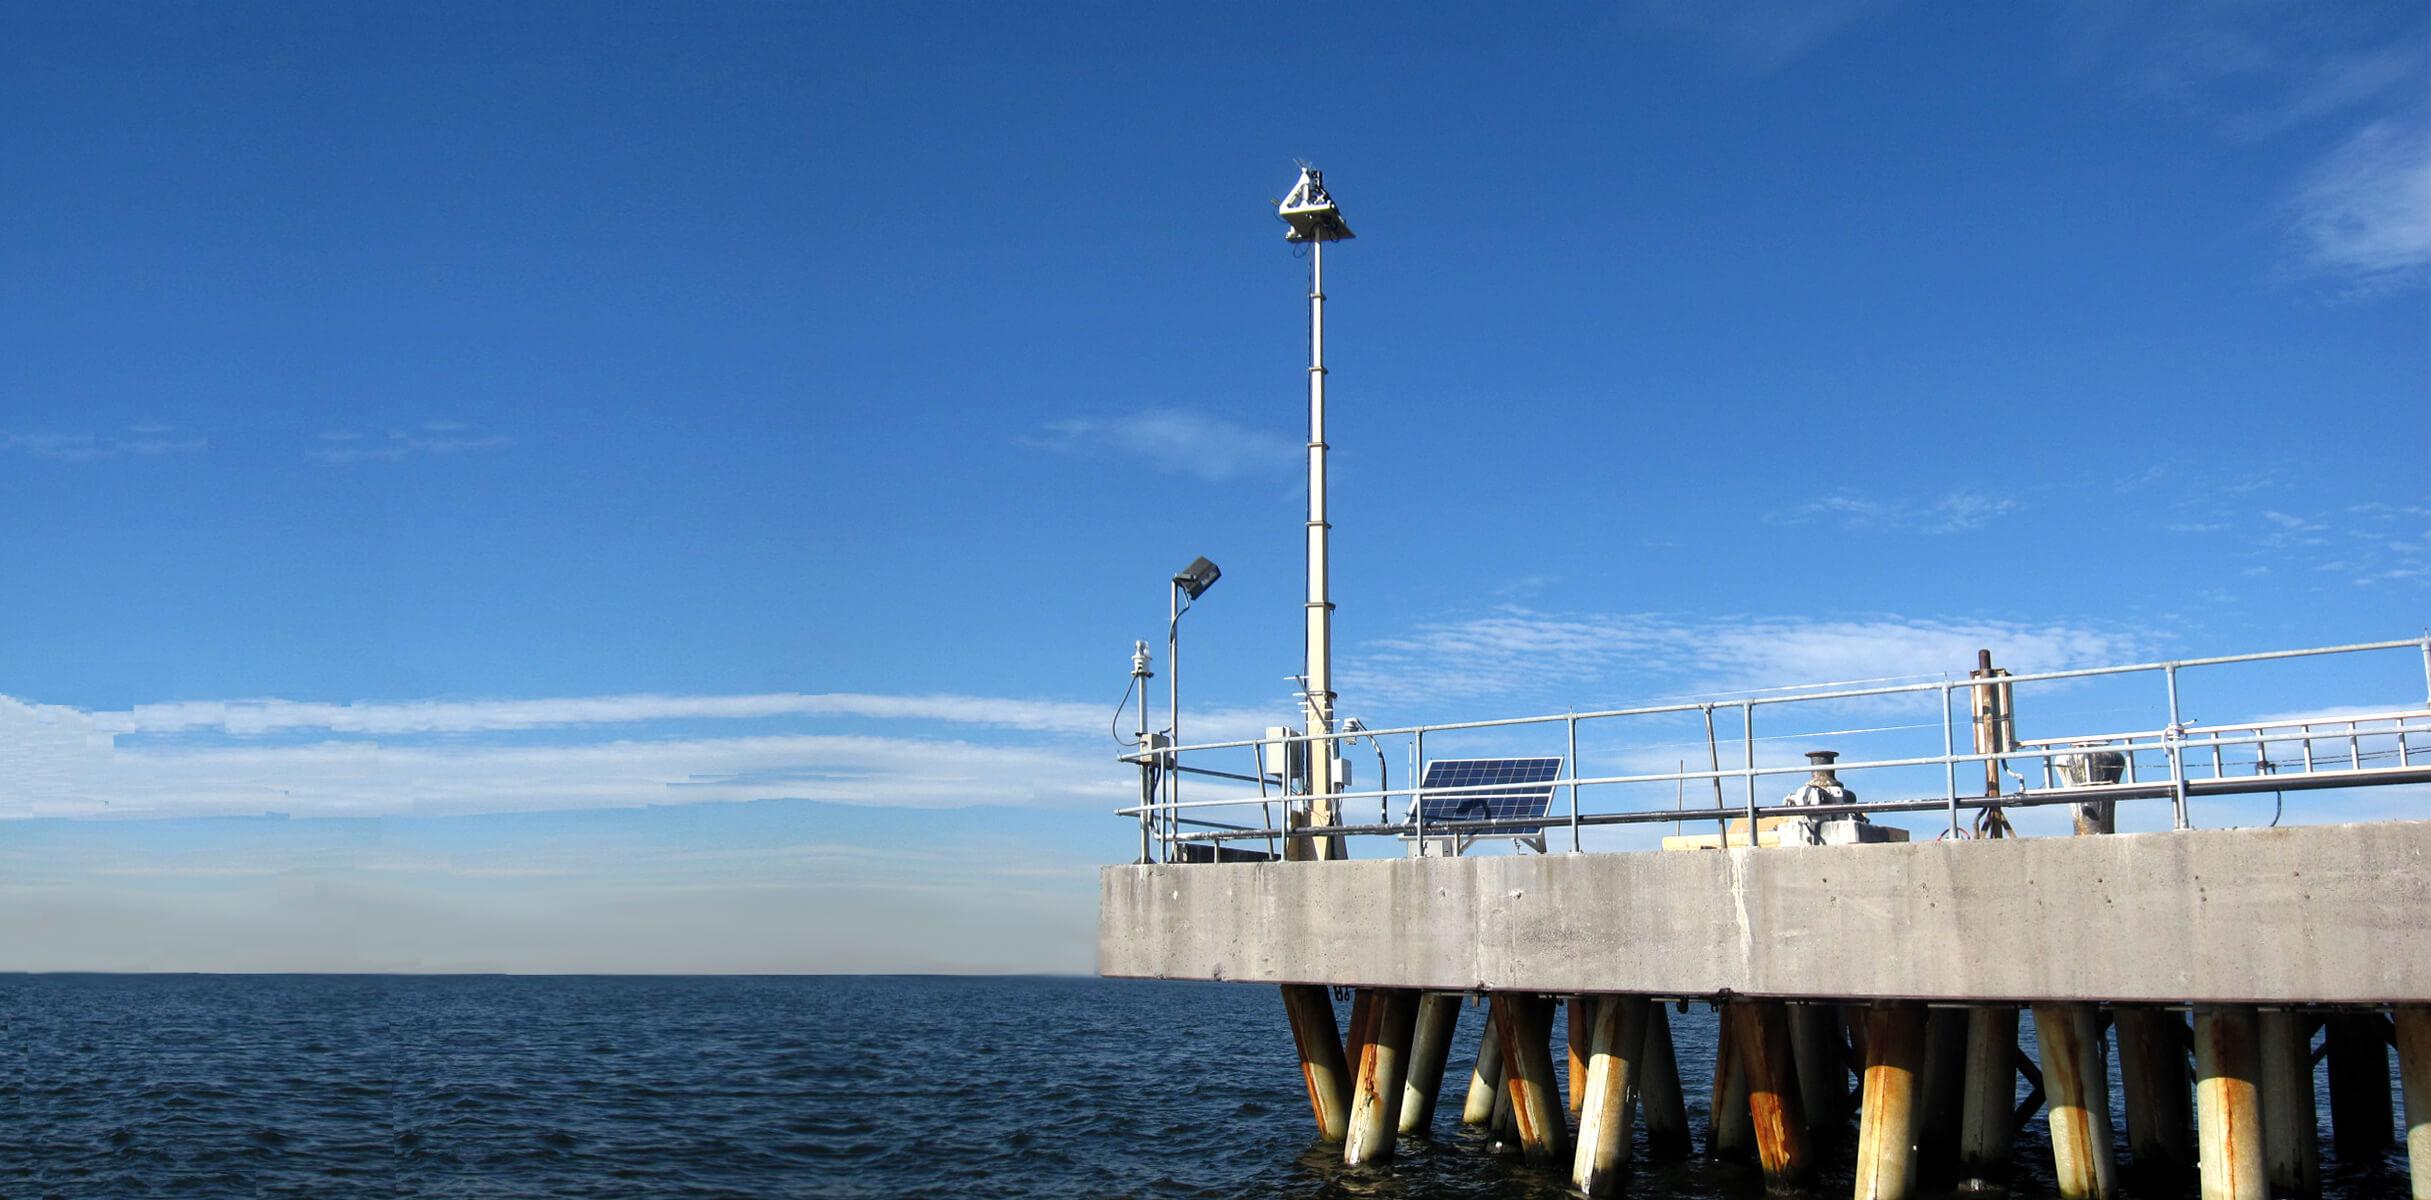 Slider-FM30-350-Mast-on-Power-Plant-Pier-Long-Island-Sound1